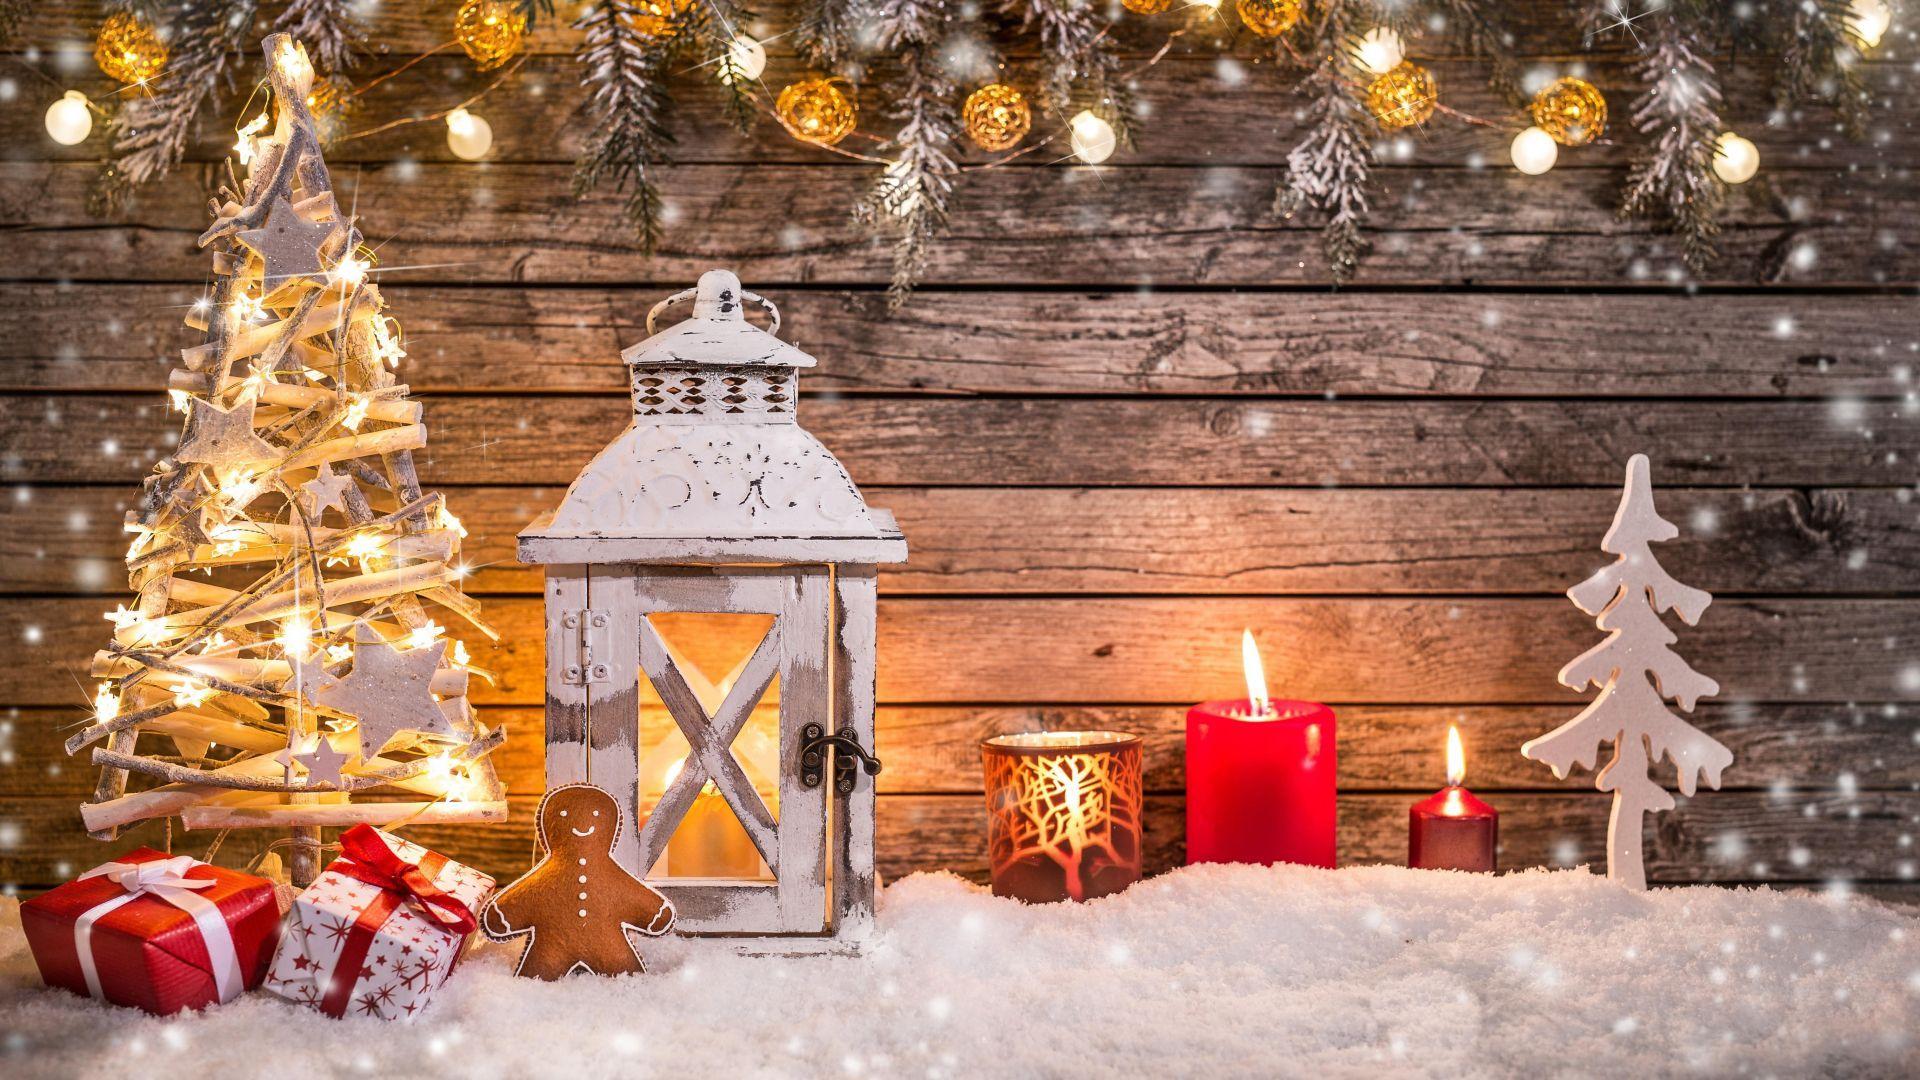 Christmas New Year Toys Fir Tree Lamp Decorations Snow 5k Horizontal Free Christmas Wallpaper Downloads Christmas Lanterns Christmas Wallpaper Free